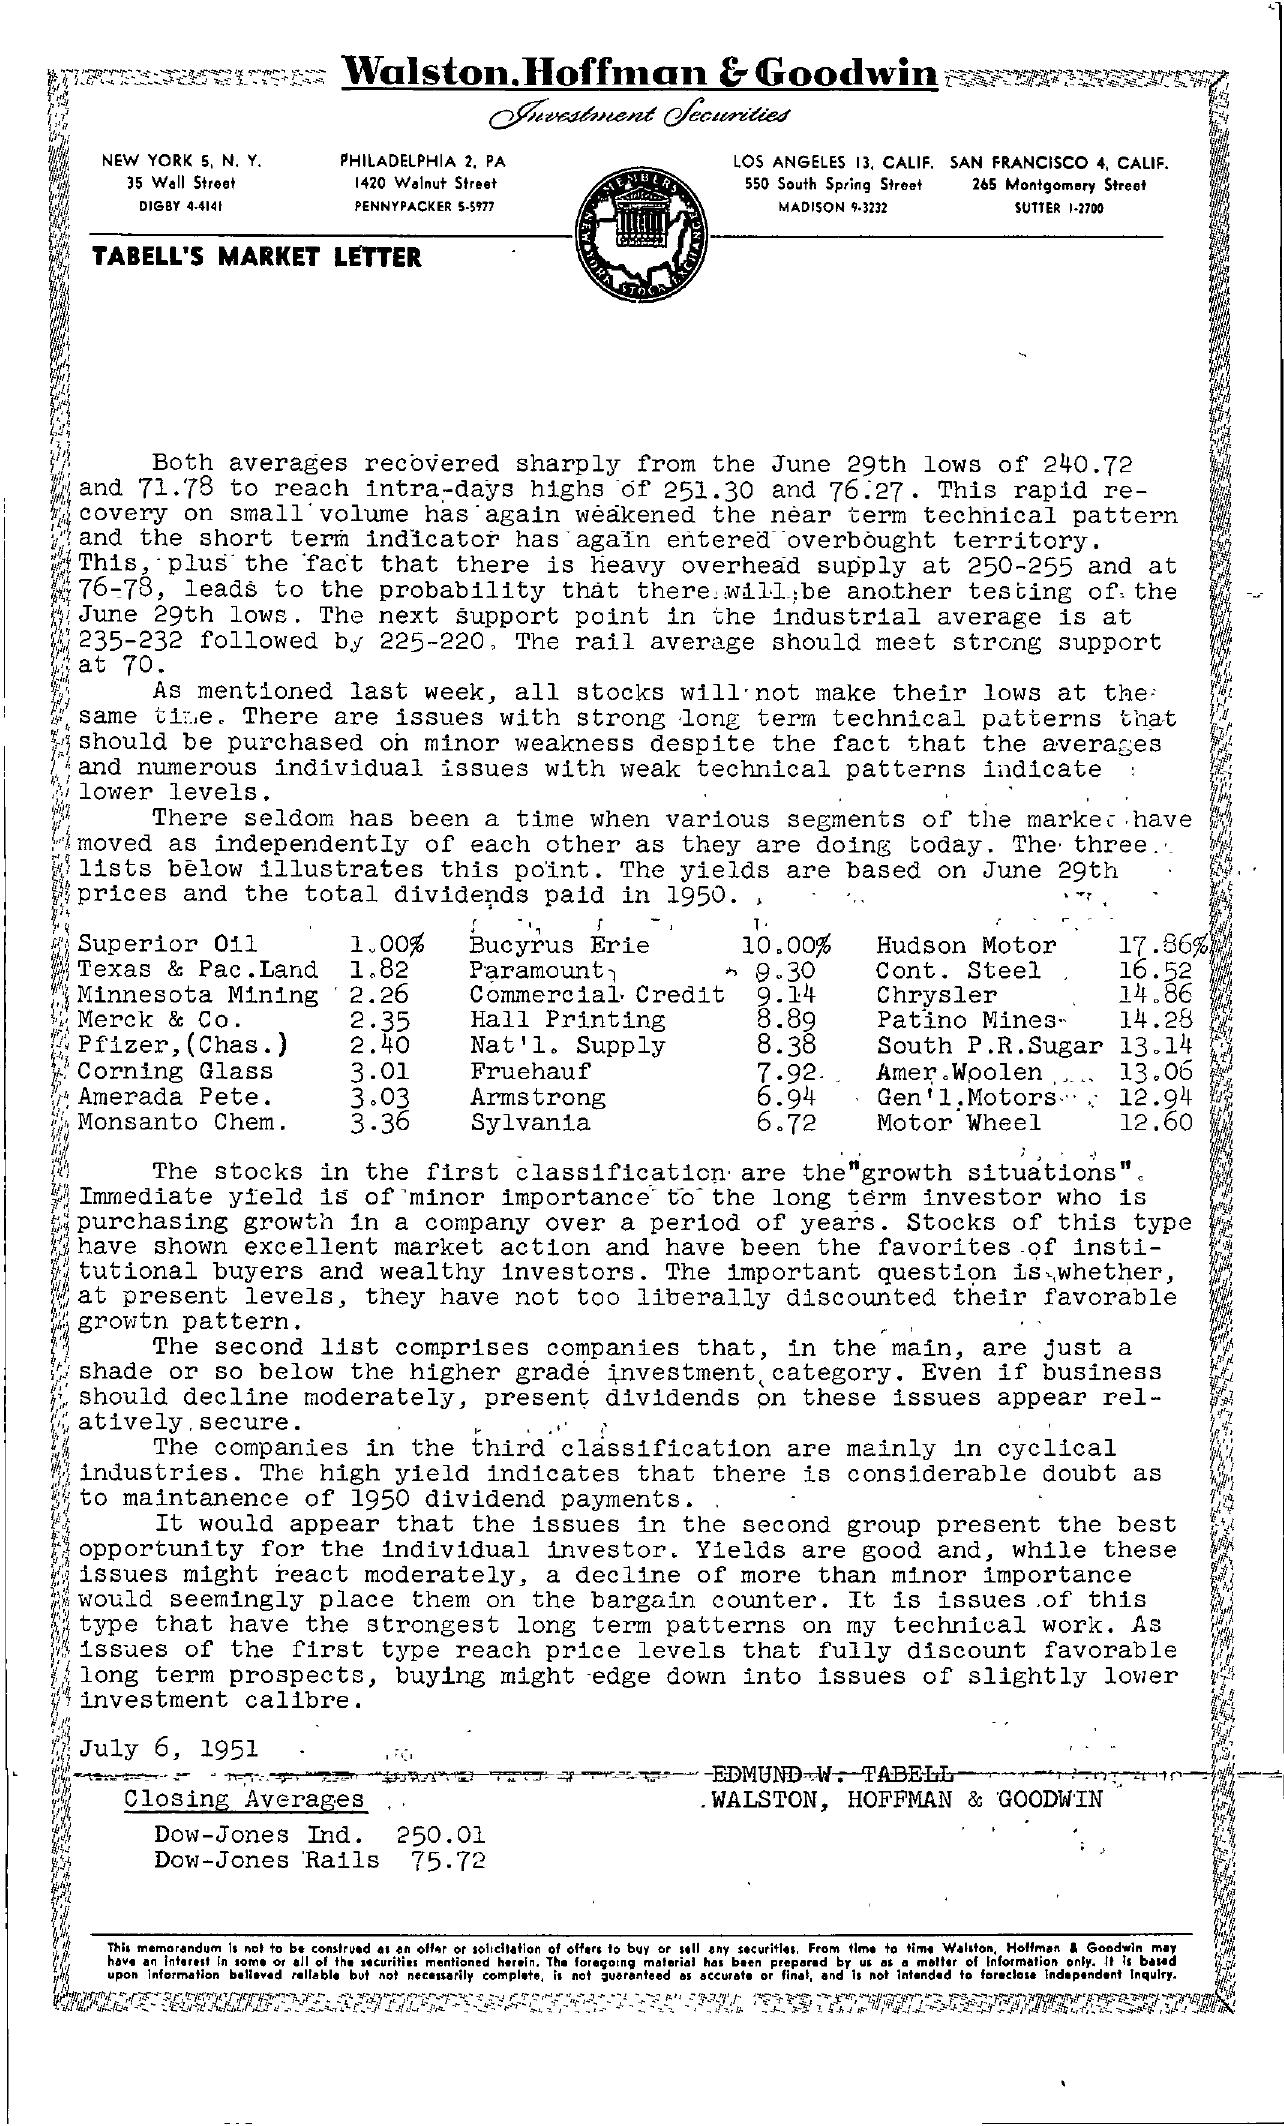 Tabell's Market Letter - July 06, 1951